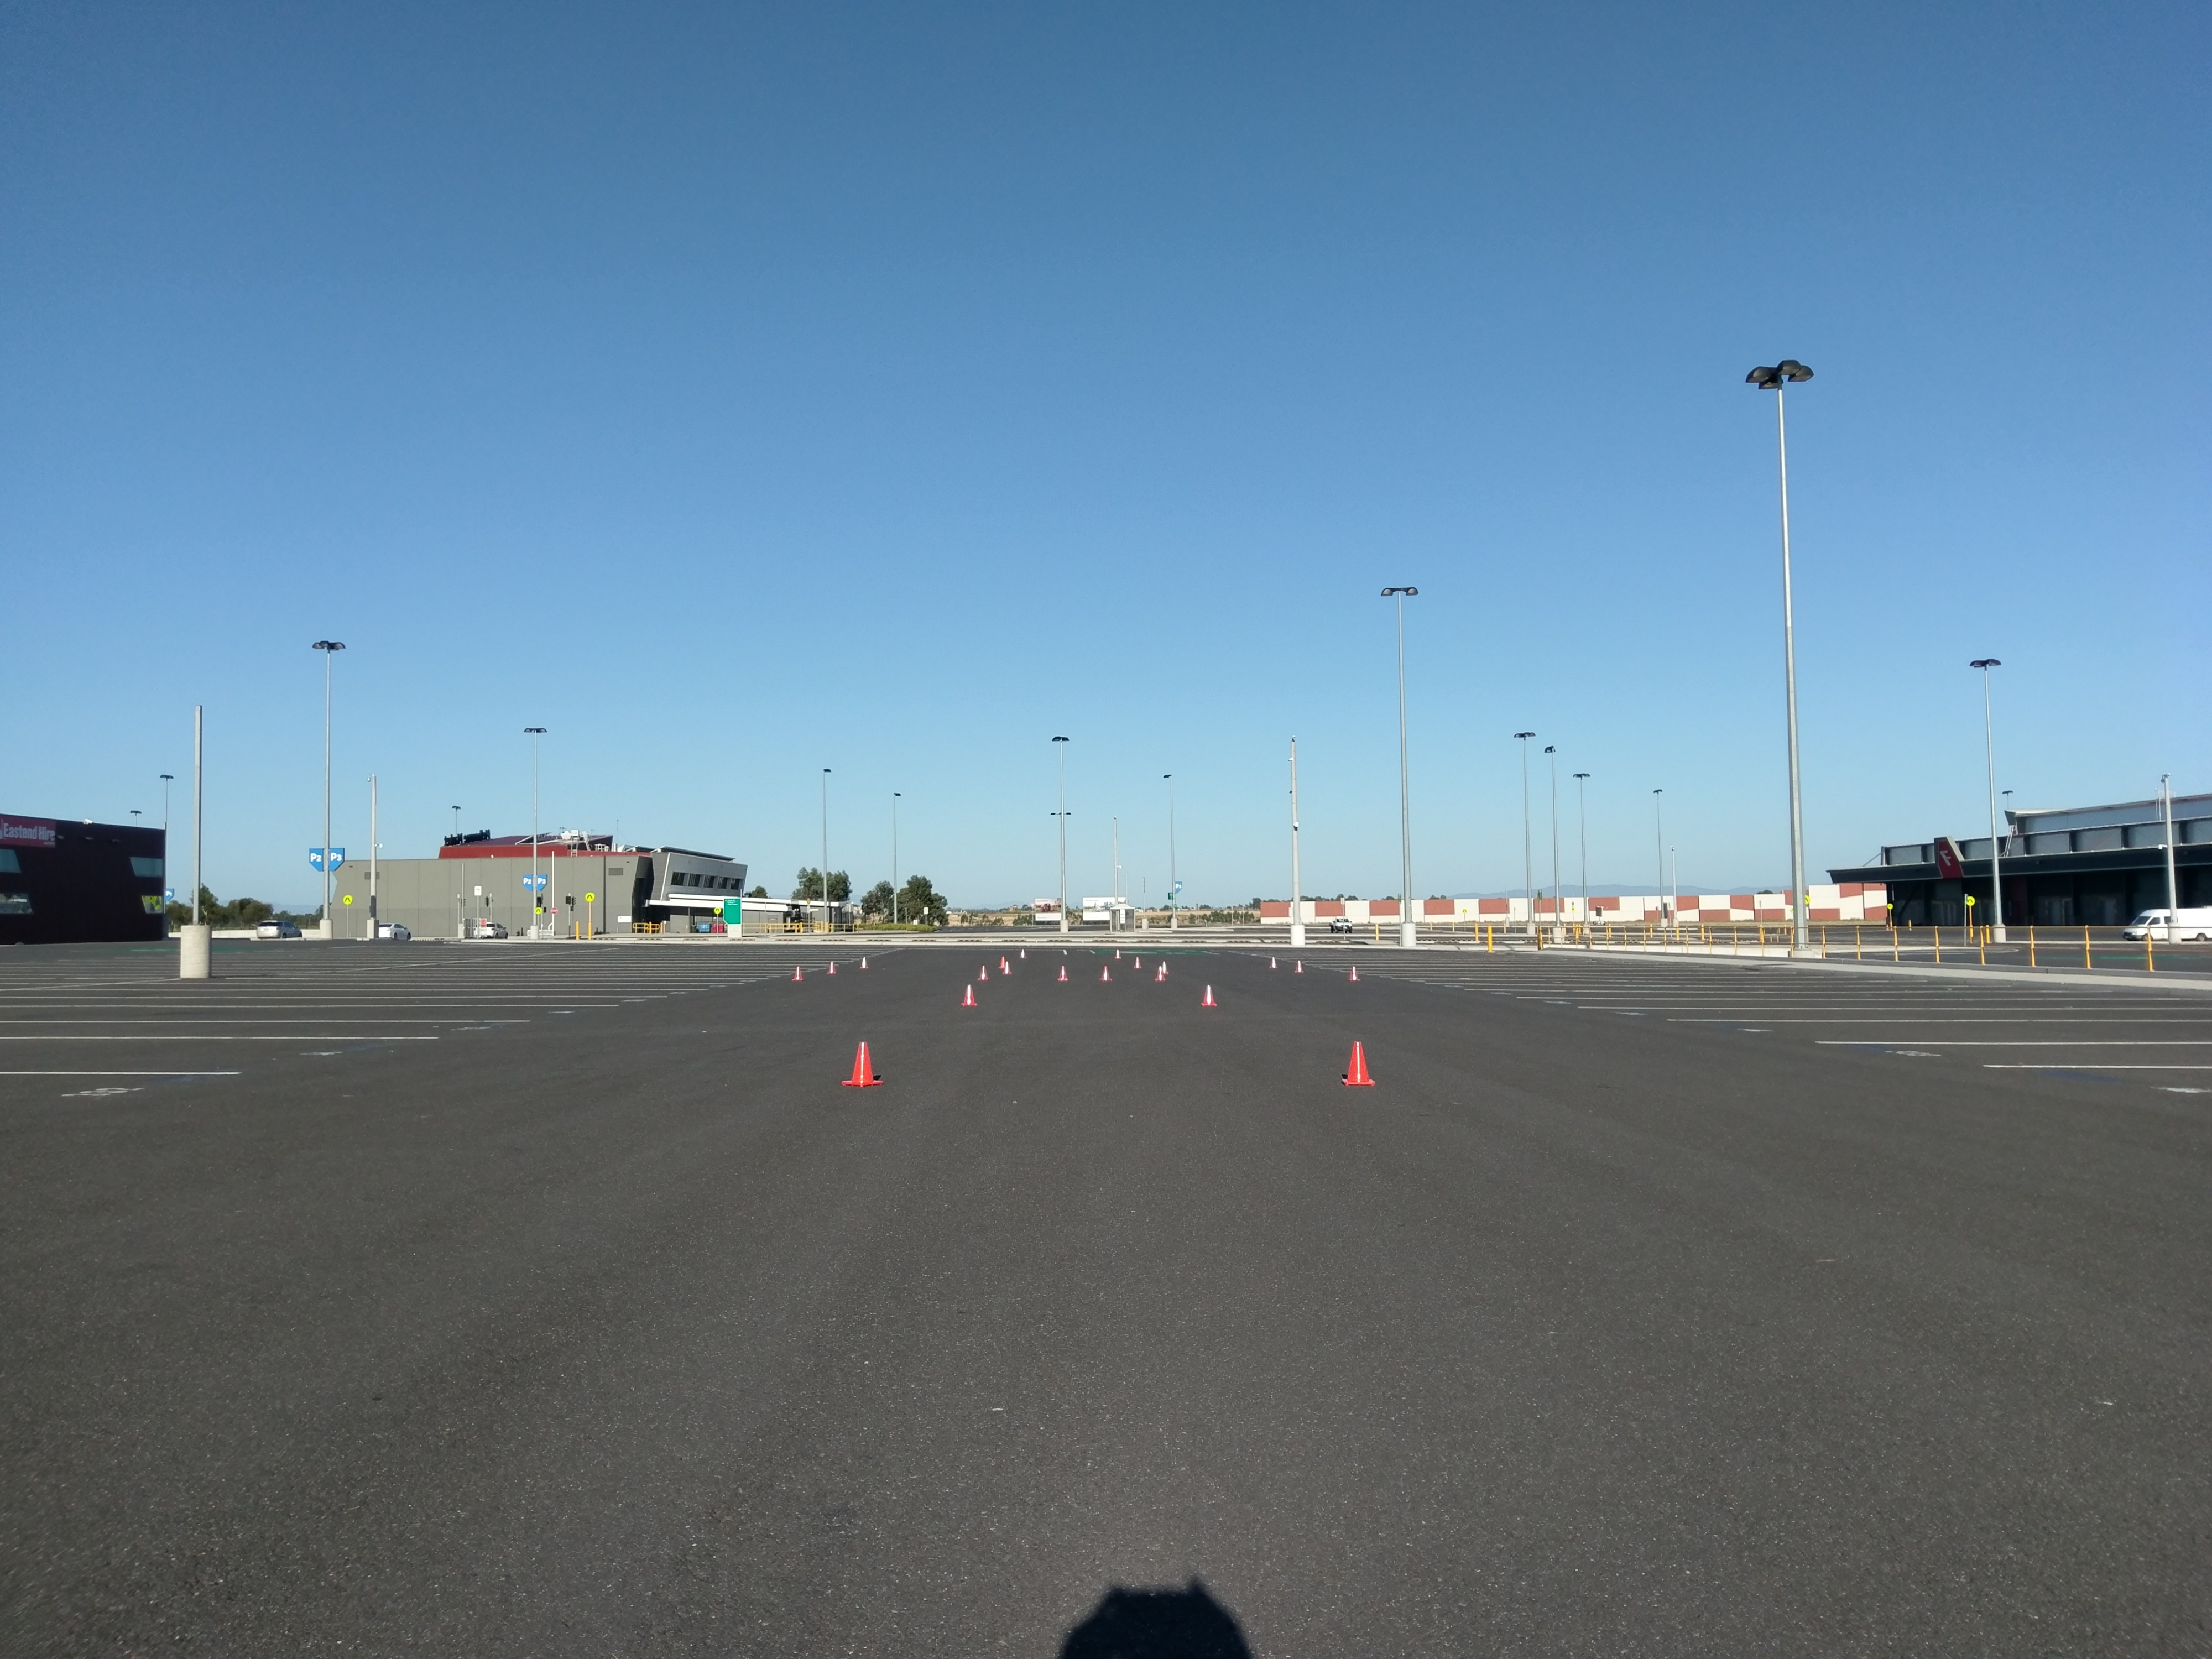 Small track